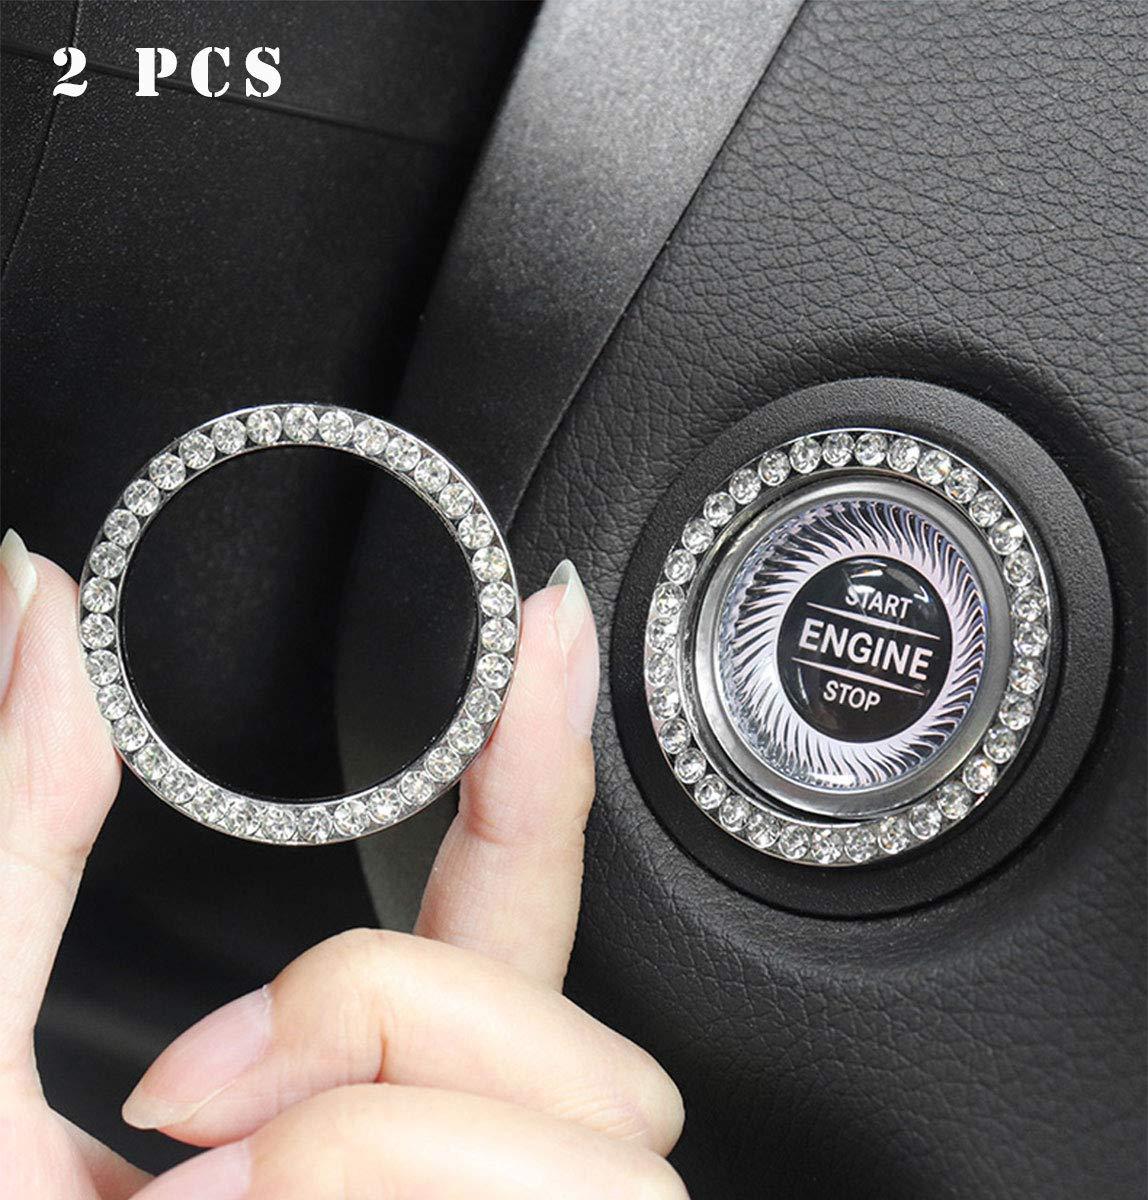 2Pcs Bling Car Engine Start Button Decorative Ring,Bling Start Button Bling Ring,Bling Car Decor Crystal Rhinestone Bling Car Accessories